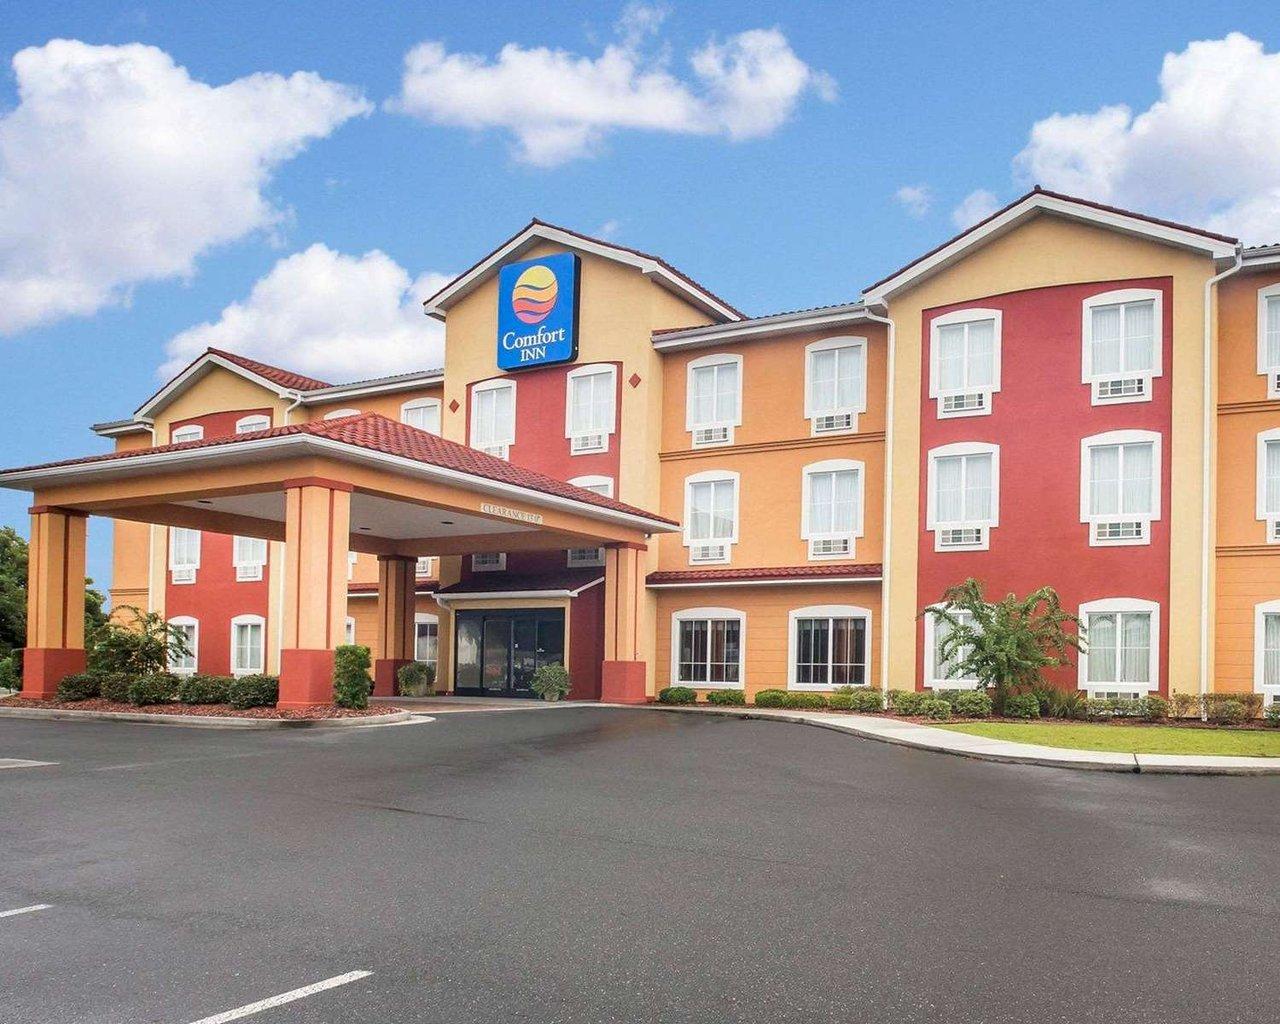 comfort inn blackshear 81 1 0 6 updated 2019 prices hotel rh tripadvisor com